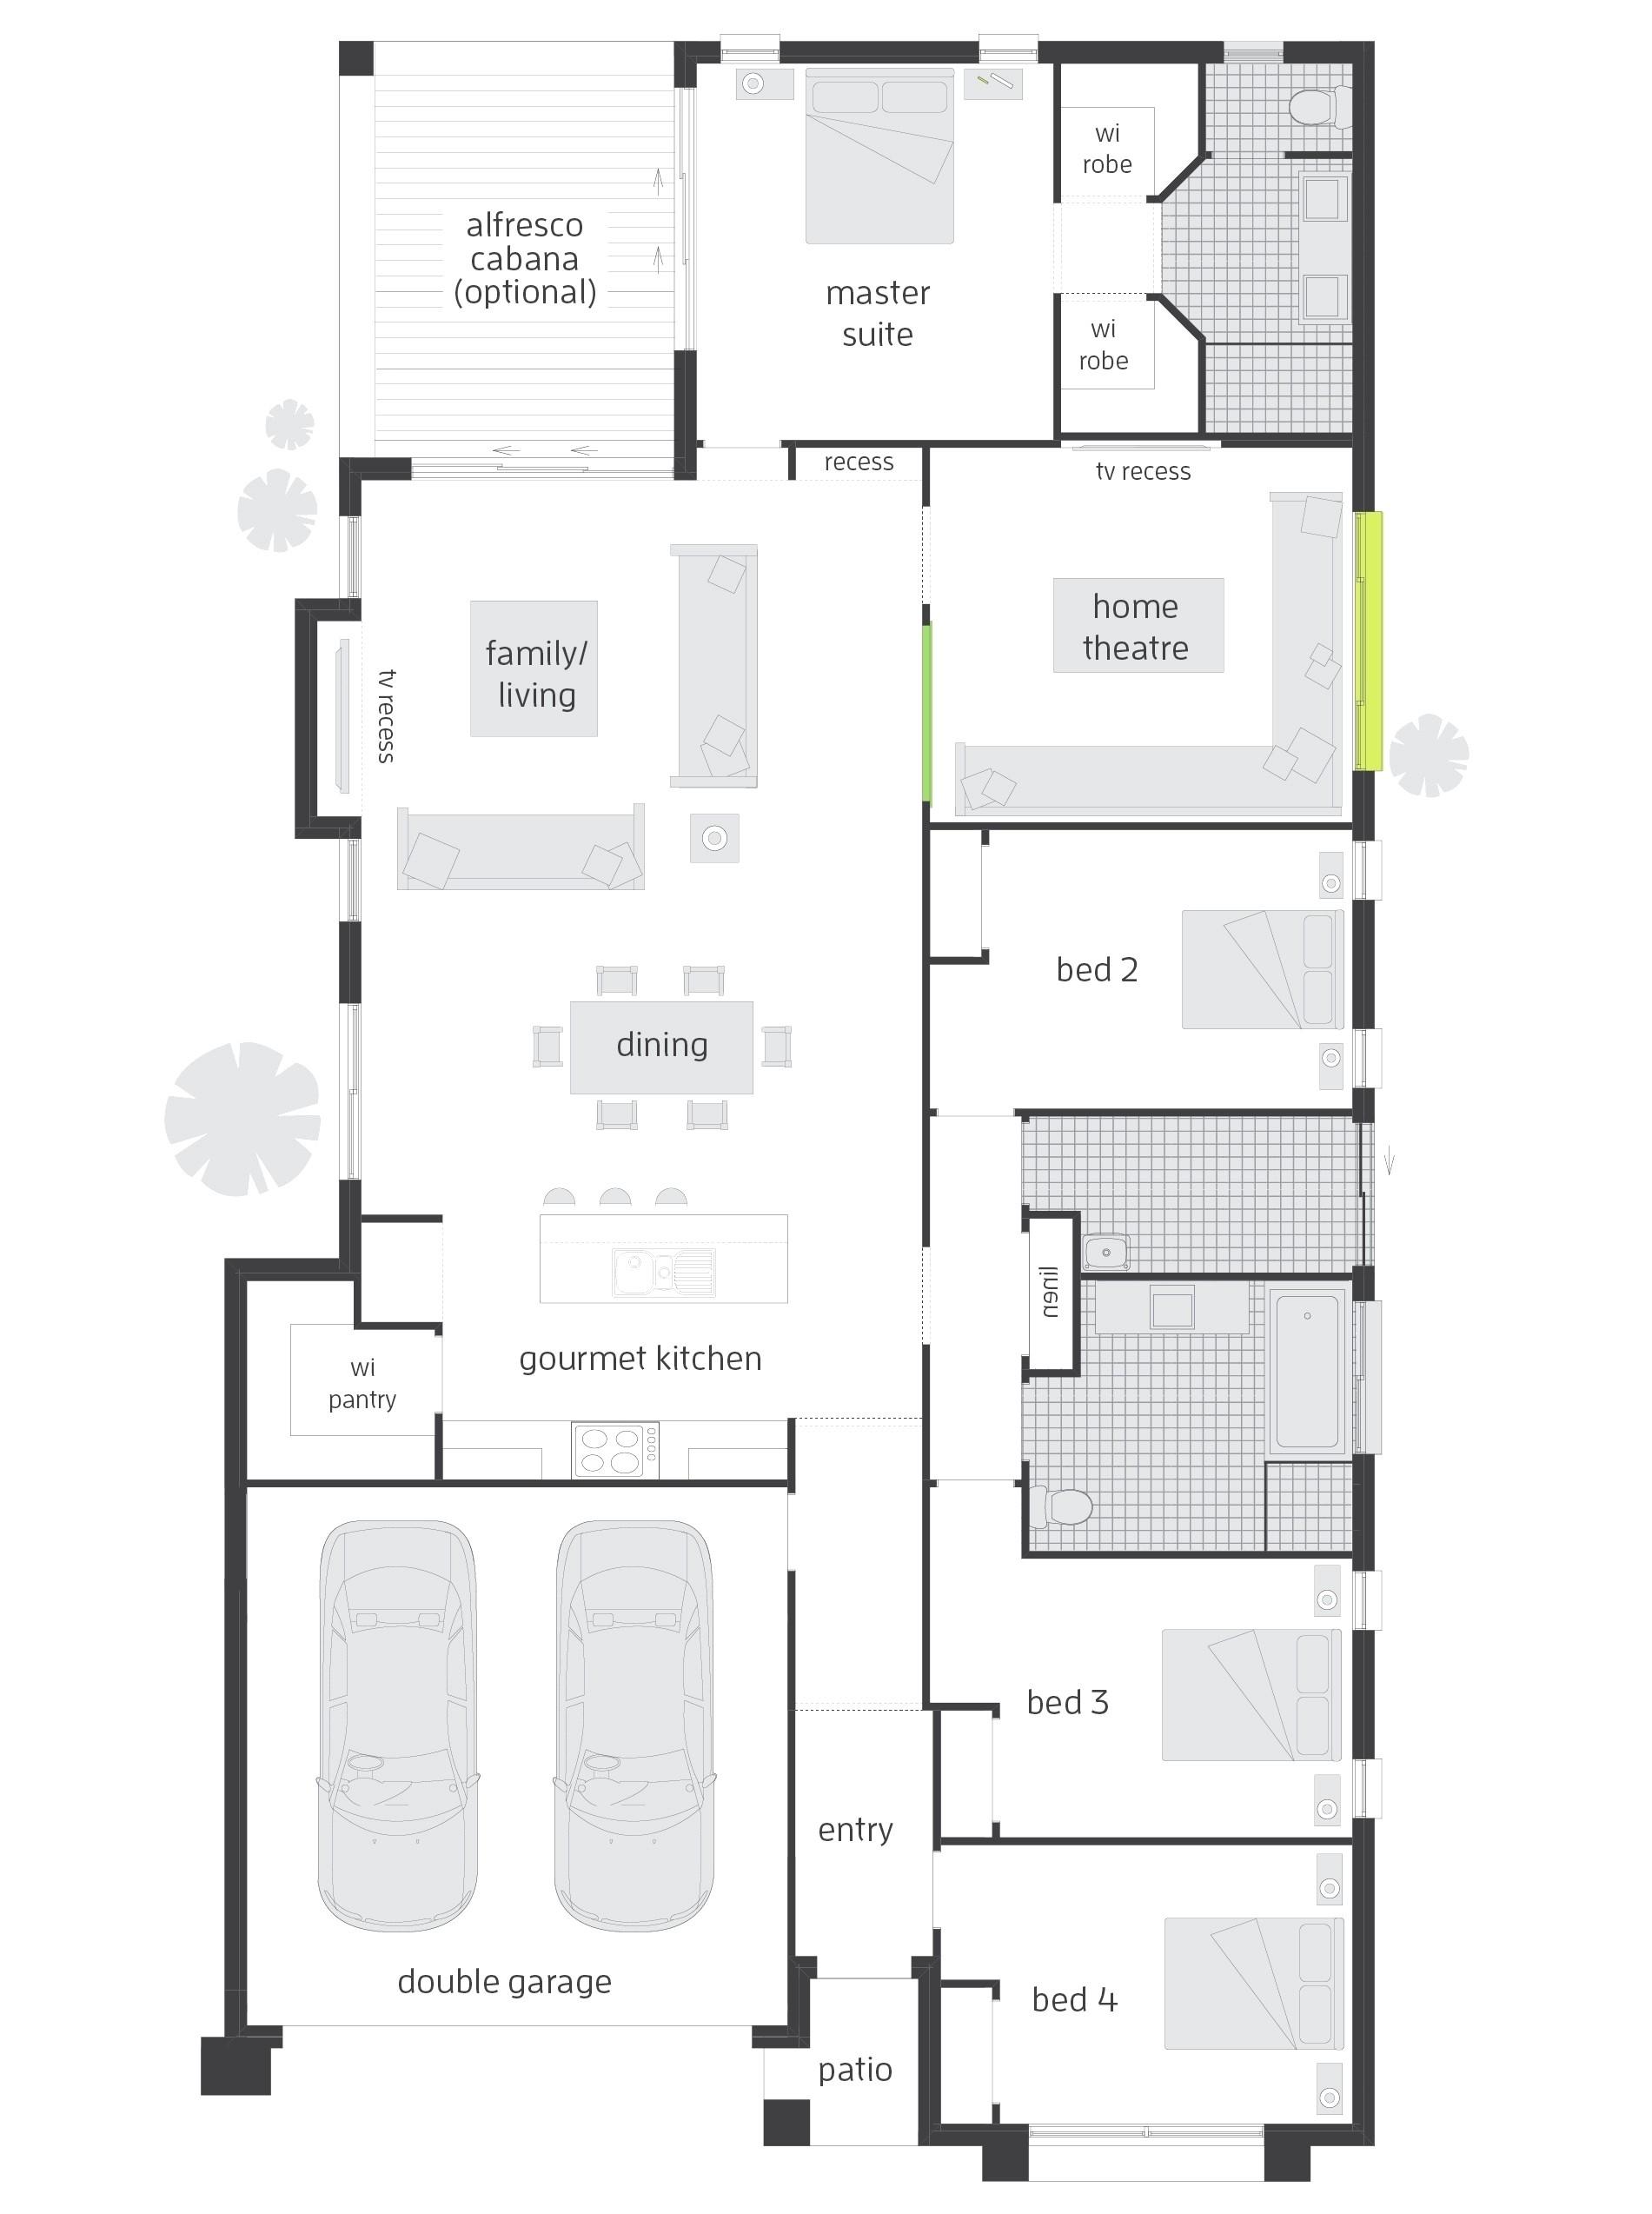 ryan homes jefferson square floor plan ryan homes jefferson square floor plan best read more as we enter